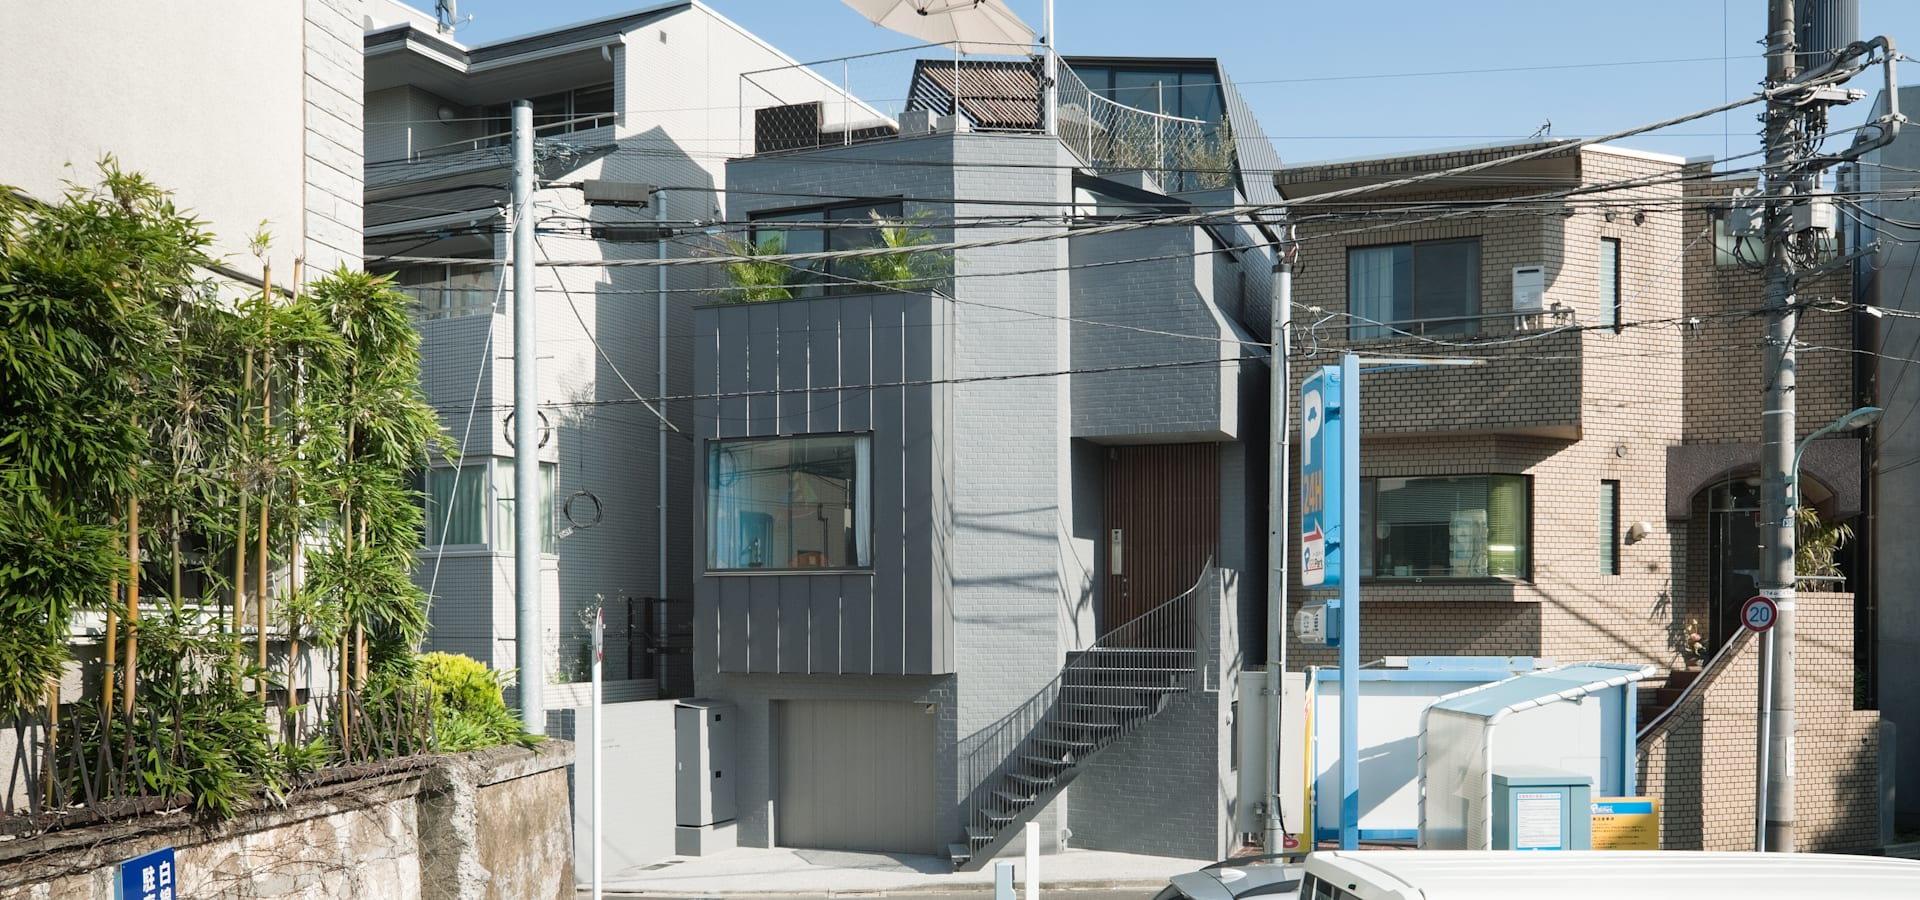 Keiji Ashizawa Design / 株式会社芦沢啓治建築設計事務所